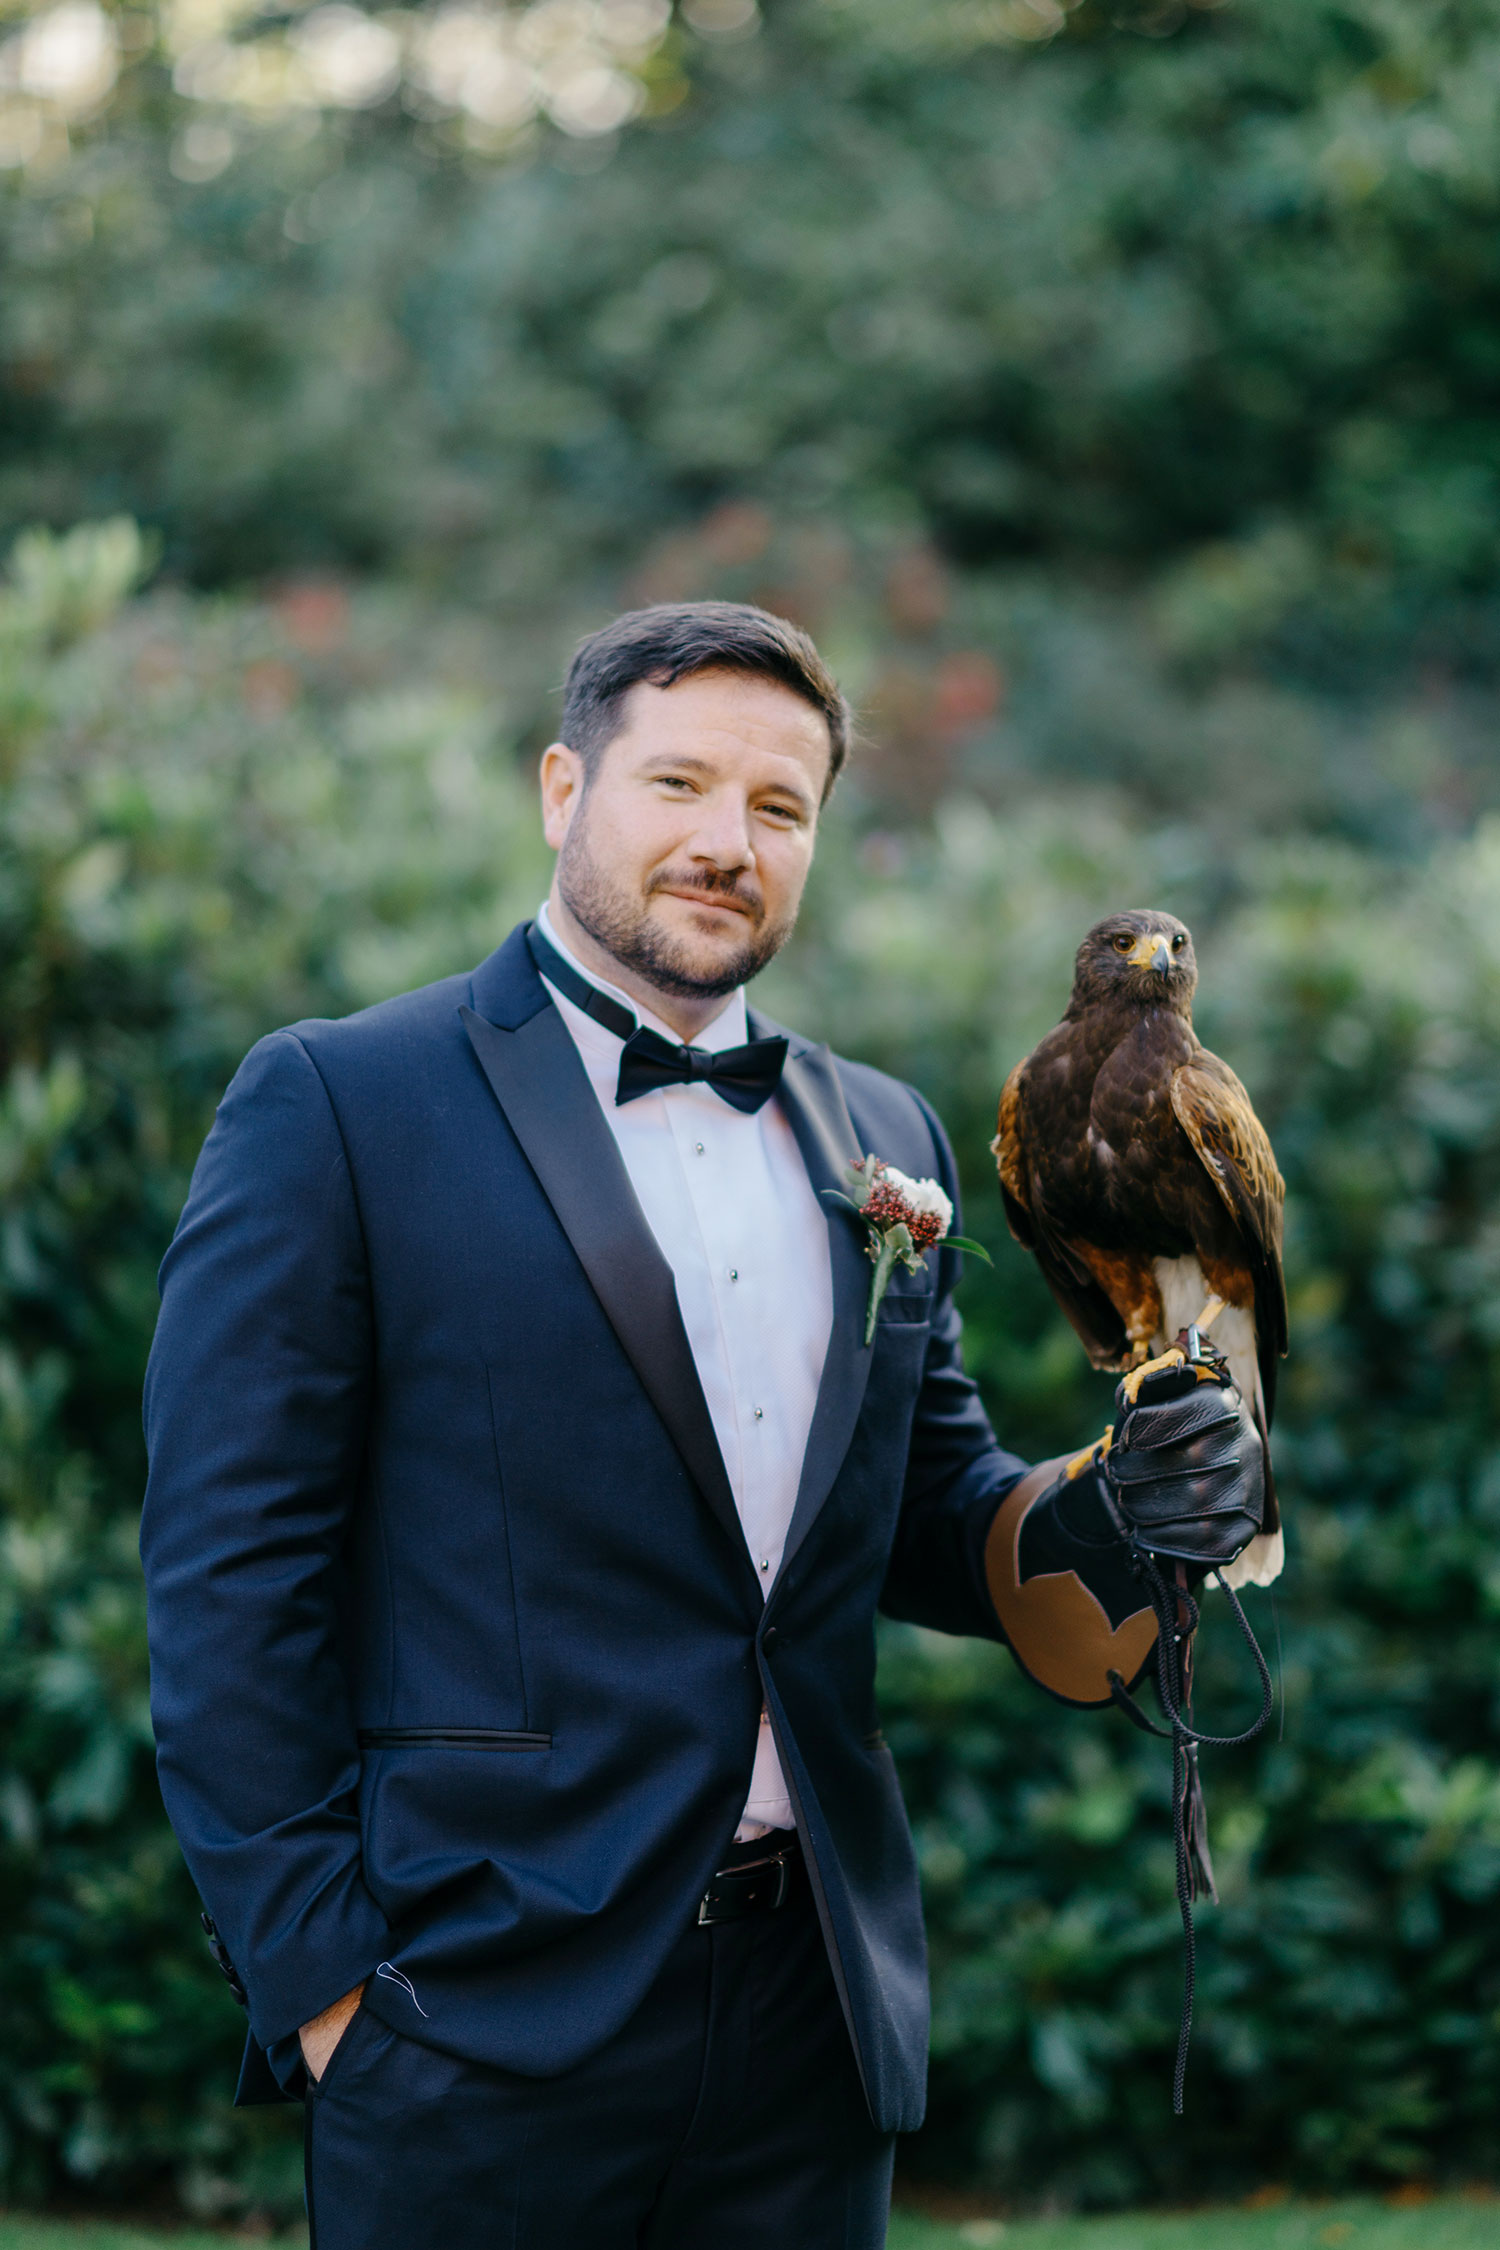 waterford-castle-wedding-photographer-0090_0090.jpg